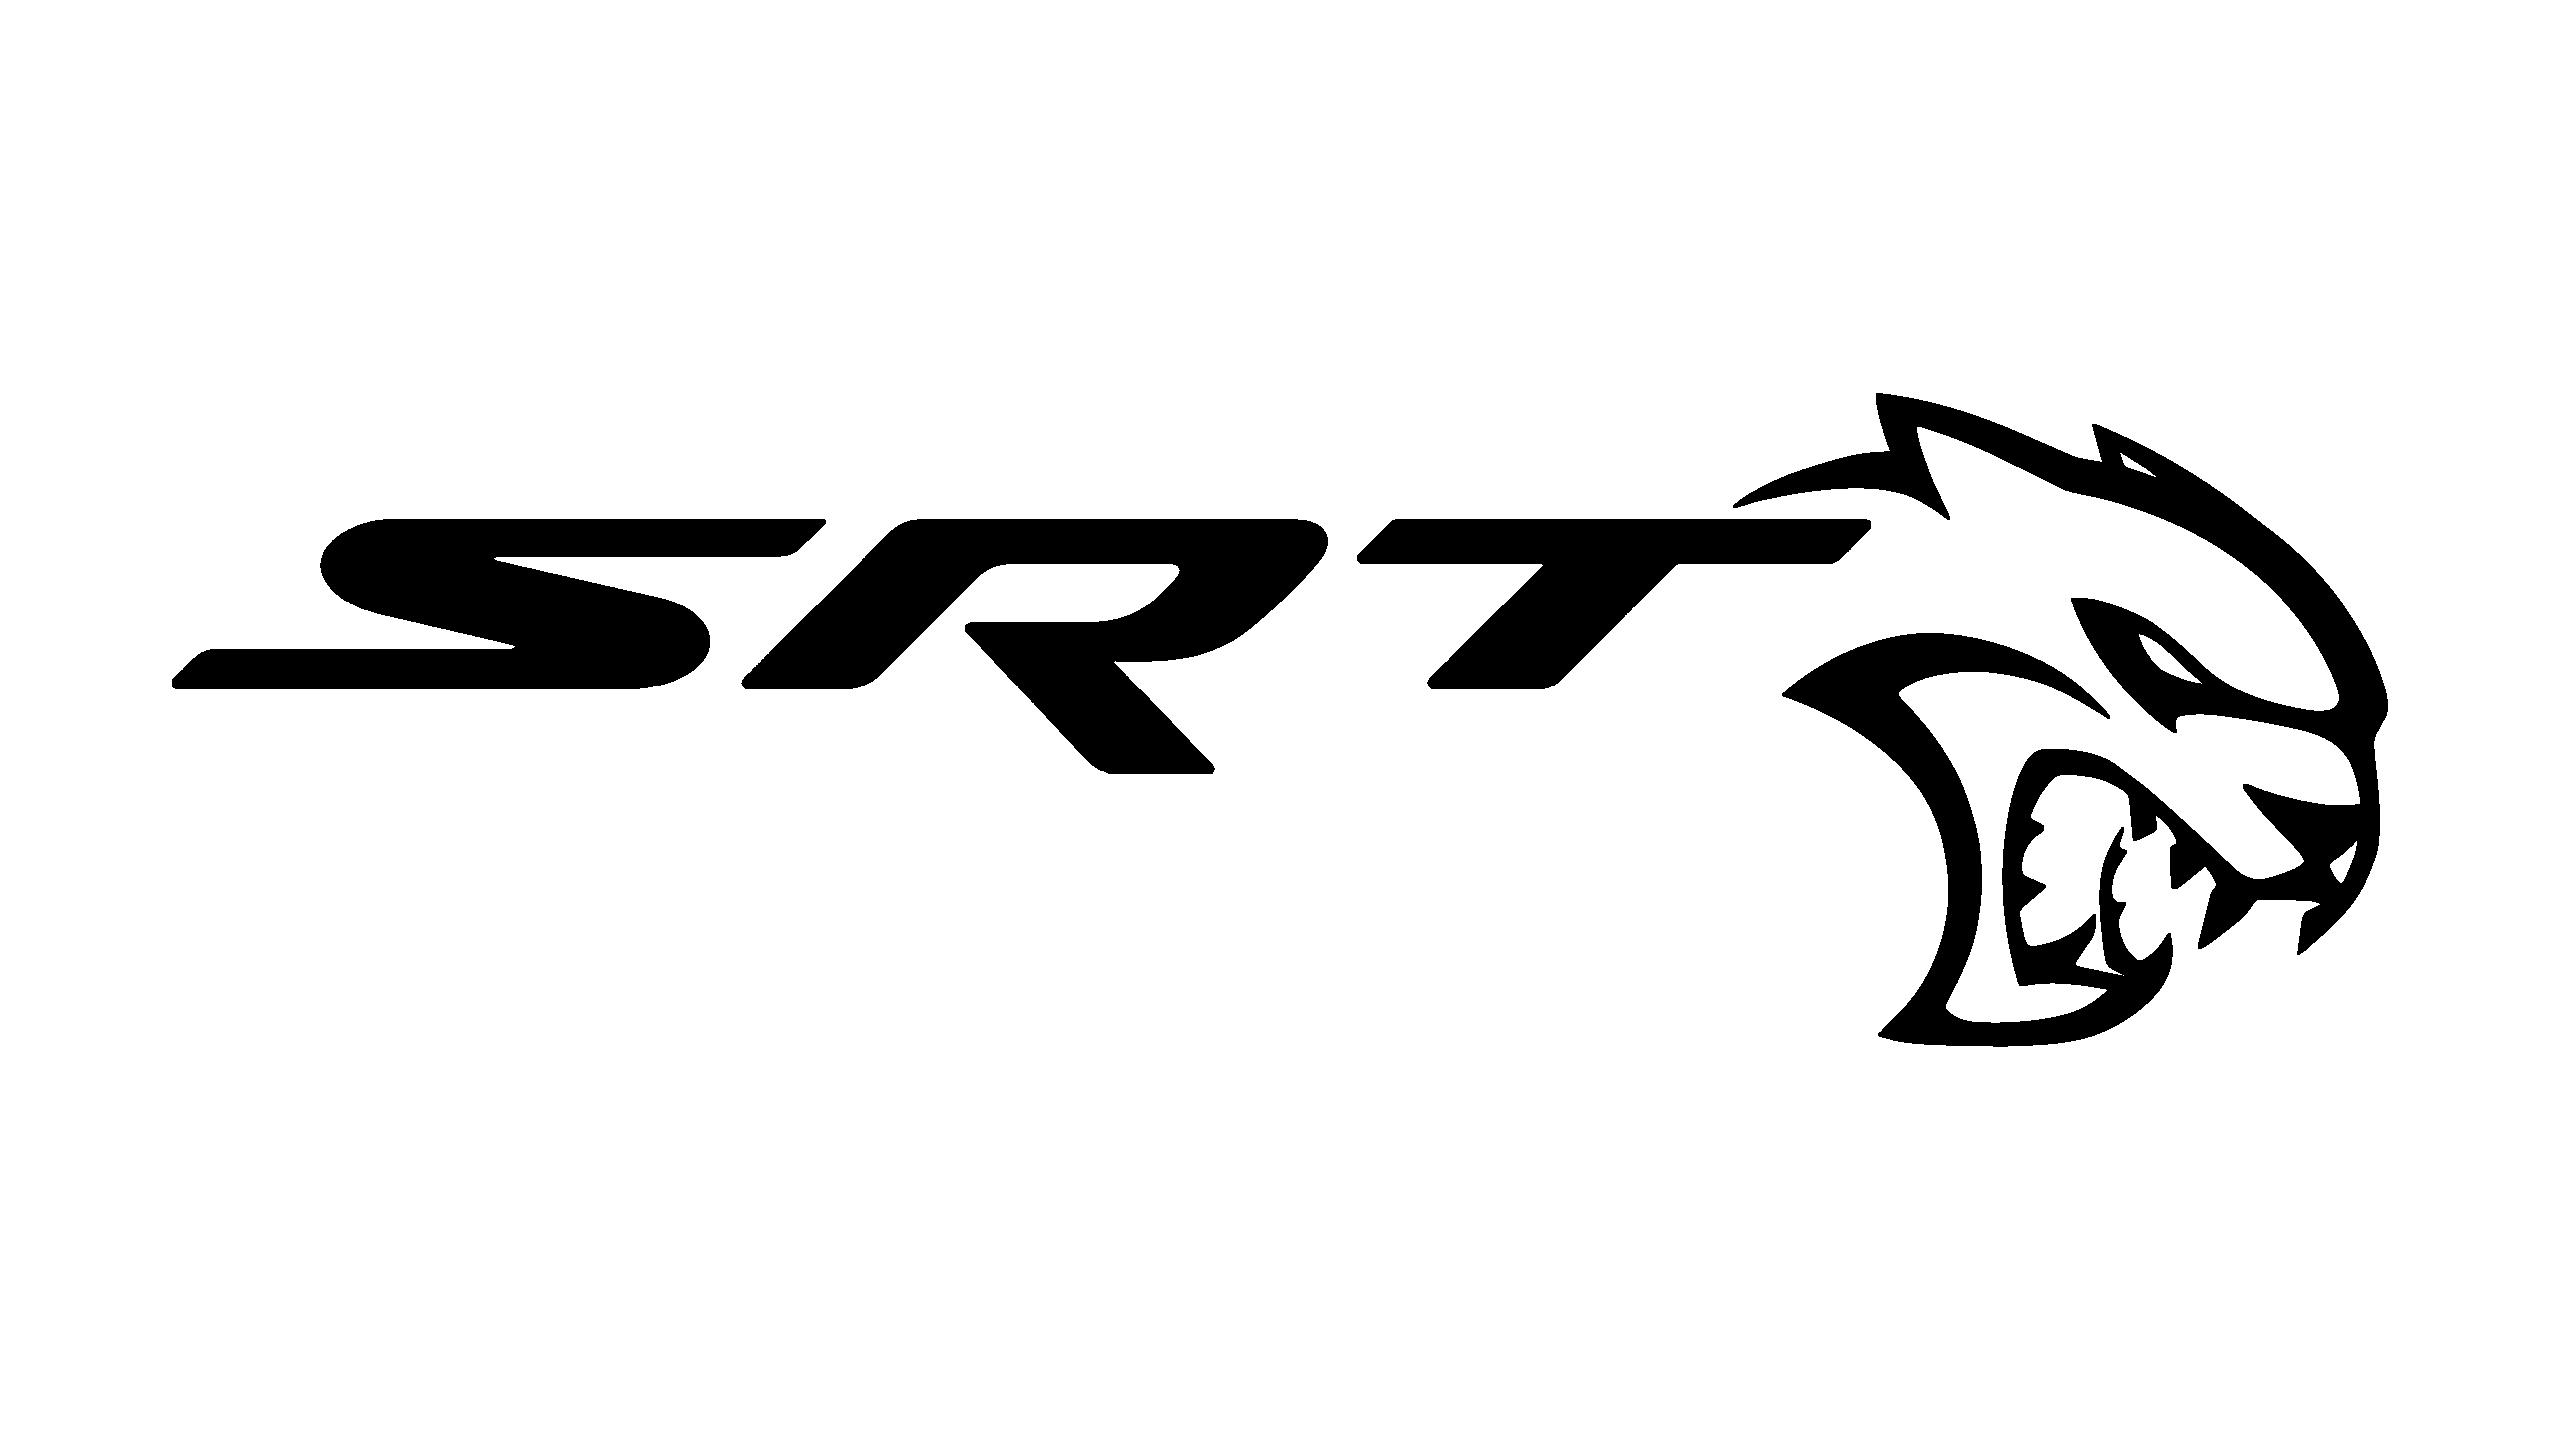 2560x1440 Srt Hellcat Logo 2560x1440.png Muscle Cars Emblems